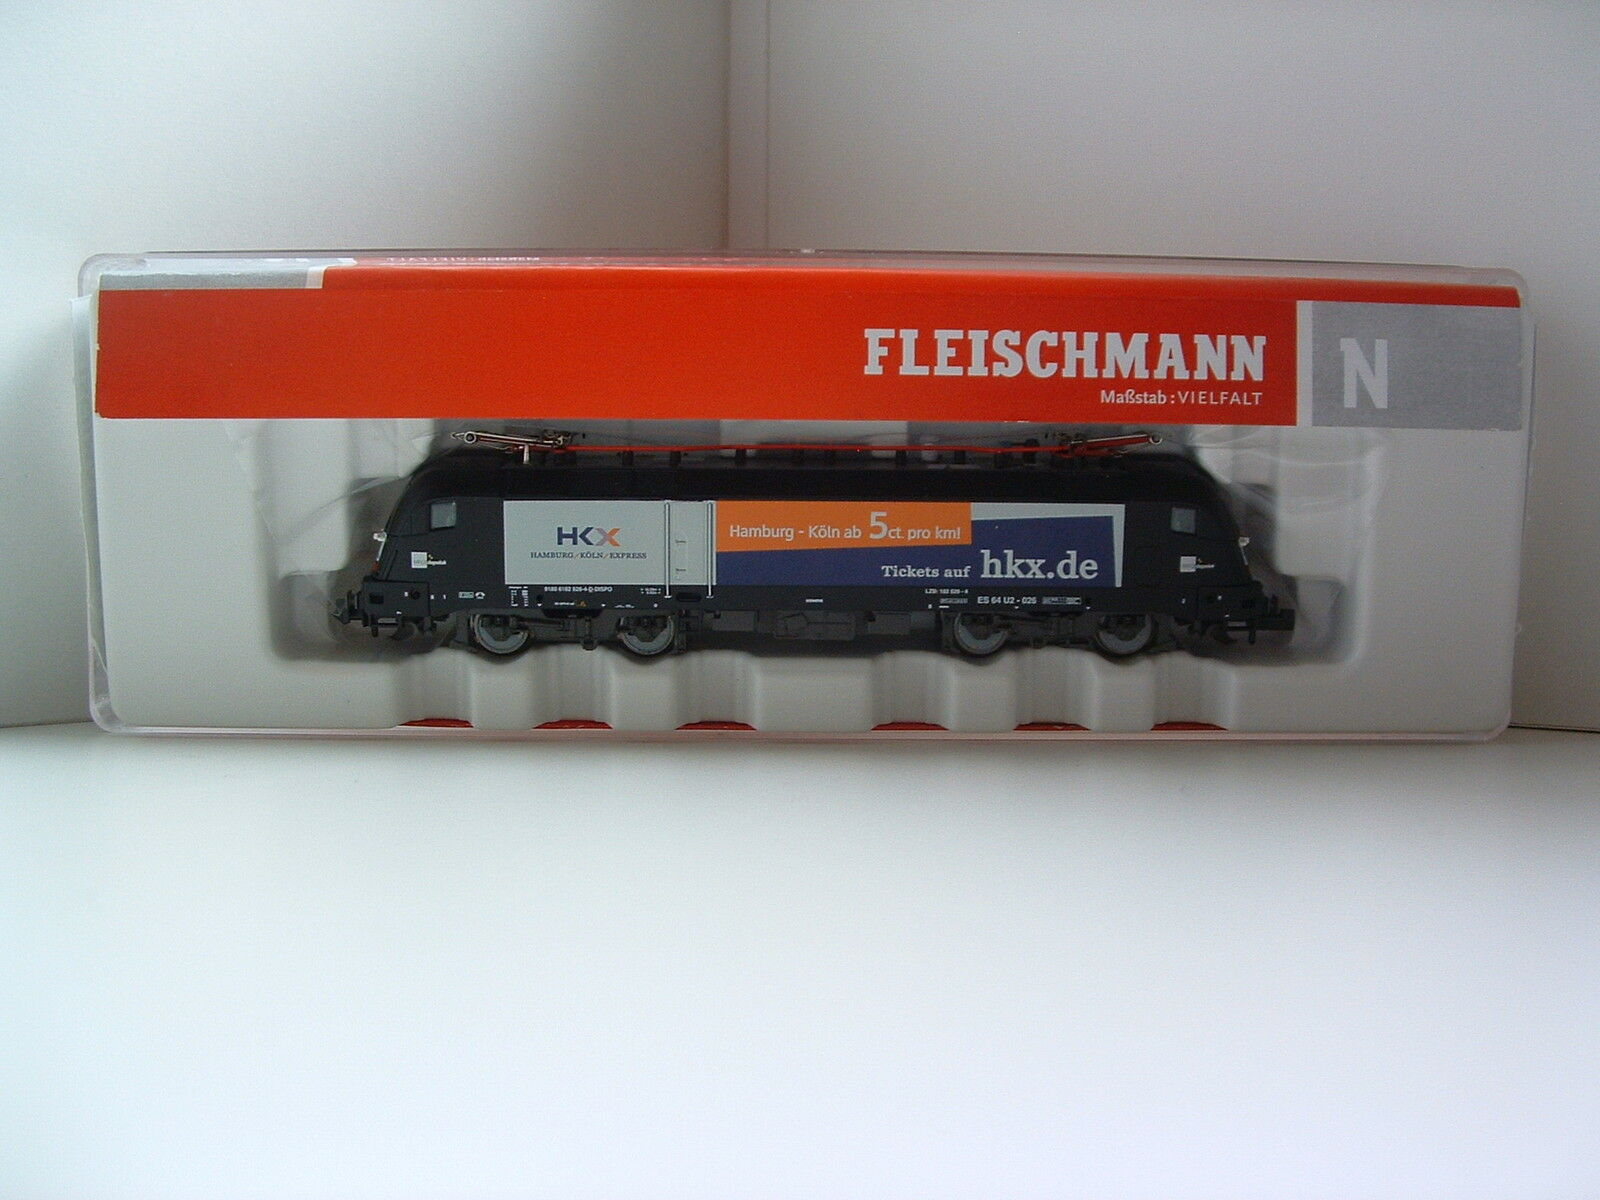 Fleischmann N 731177 E-Lok es 64 u2-026 HKX. de EP. vi Digital Sound OVP n2